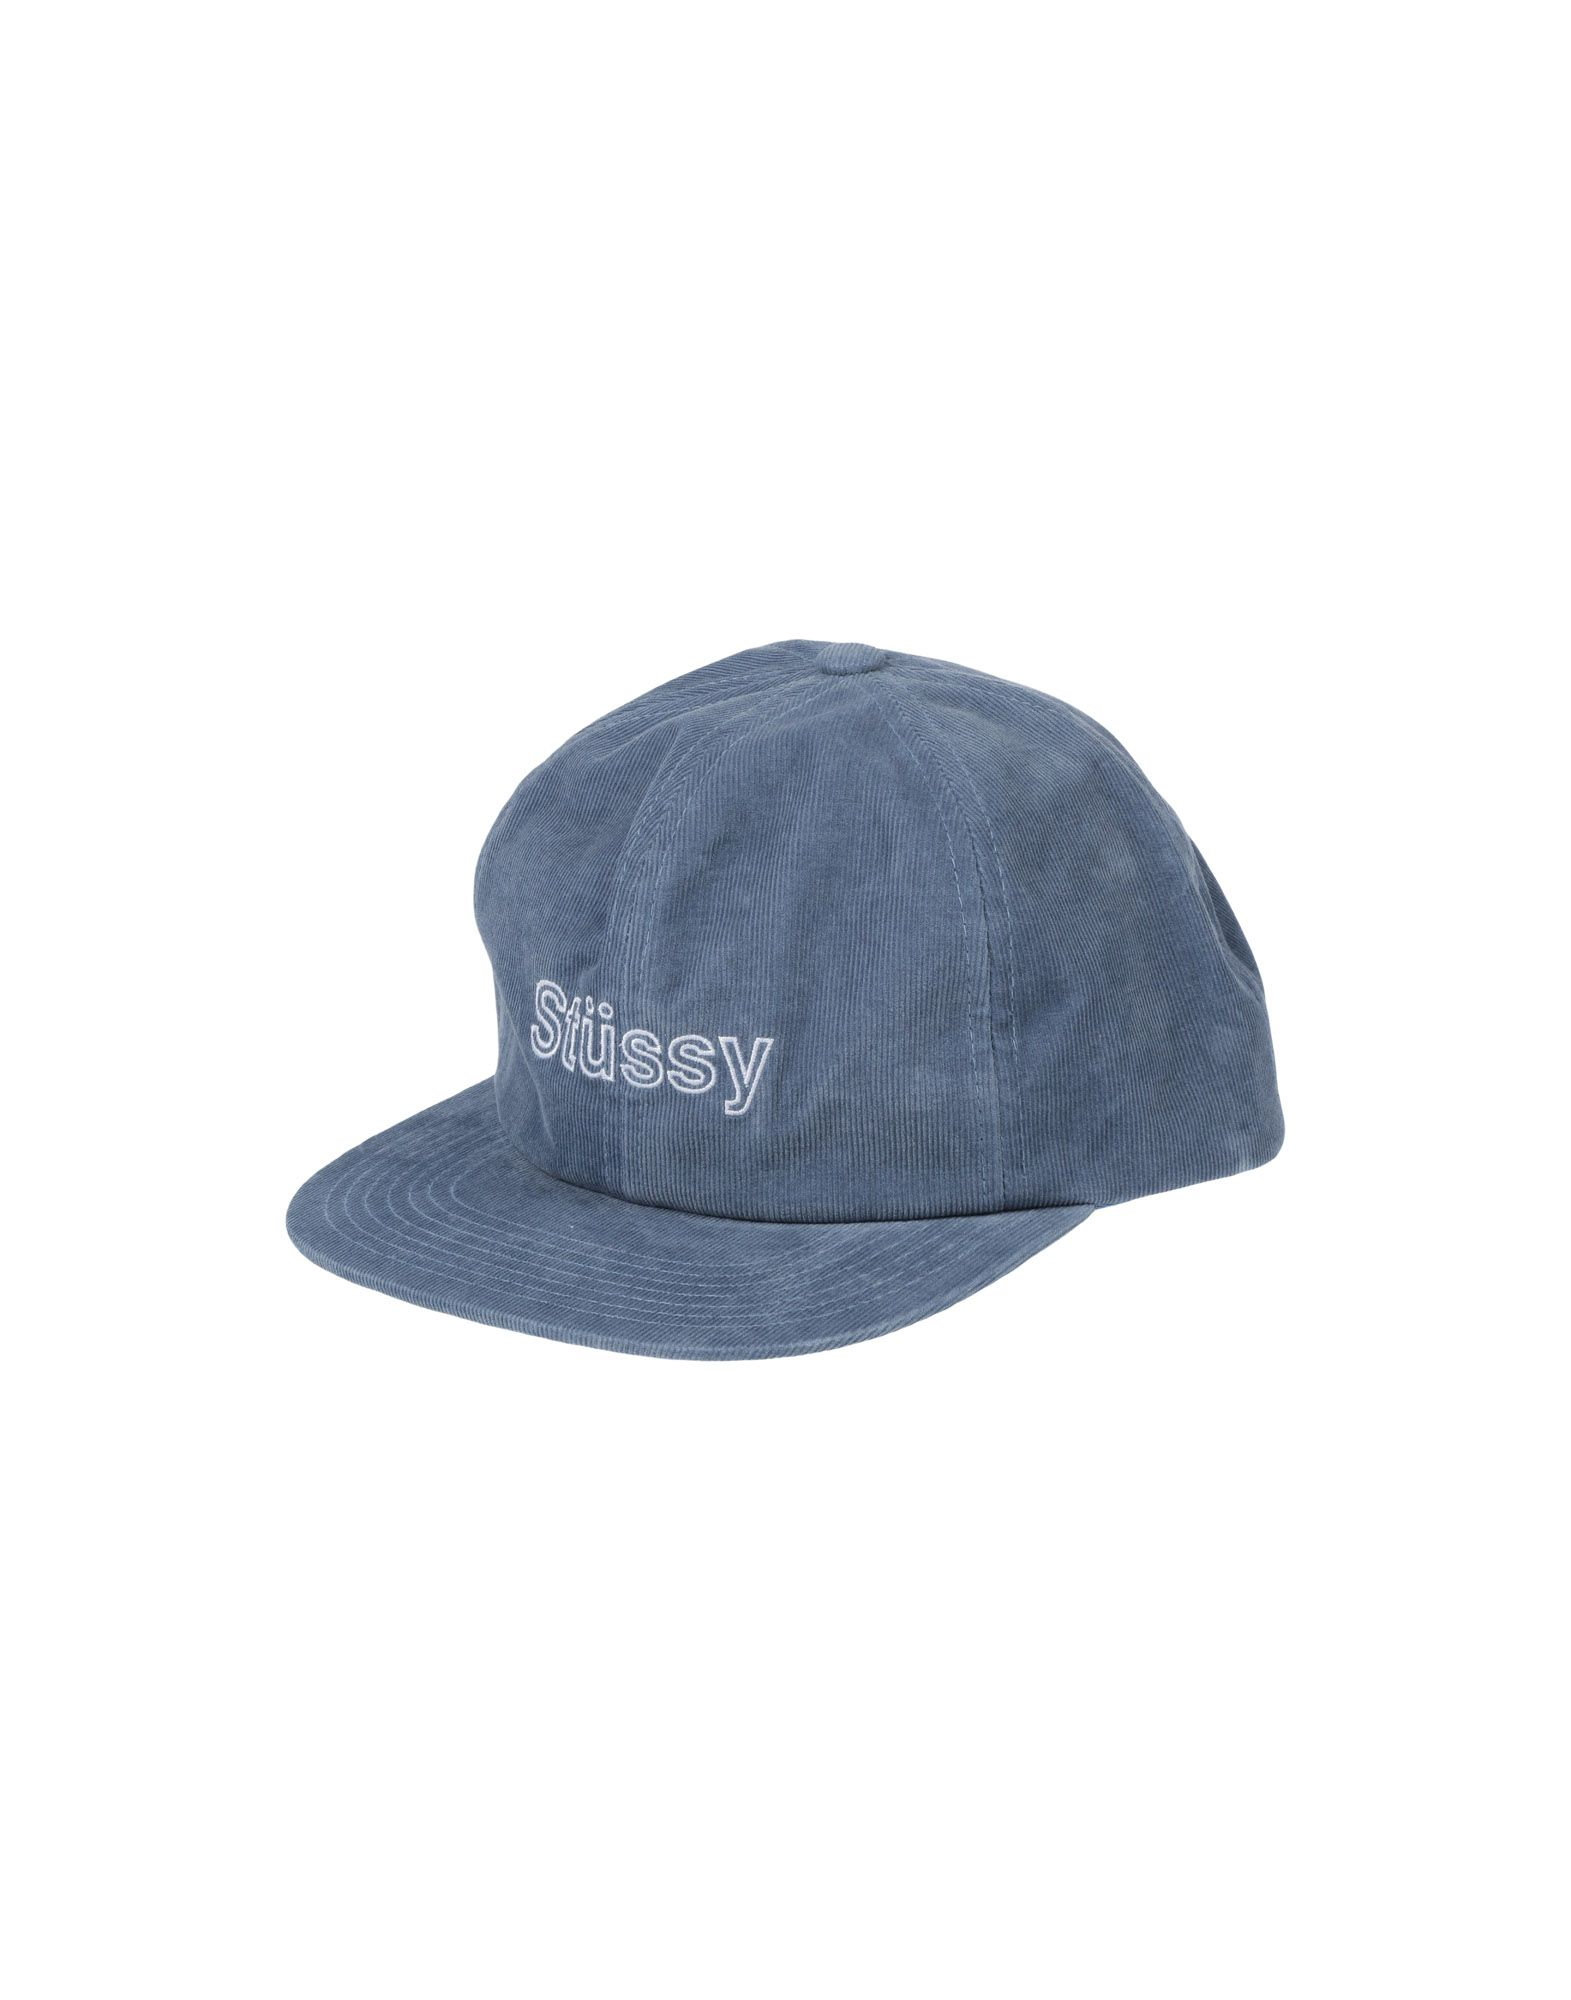 STUSSY Головной убор головной убор stussy bucket hat supreme zombie a$ap huf hater